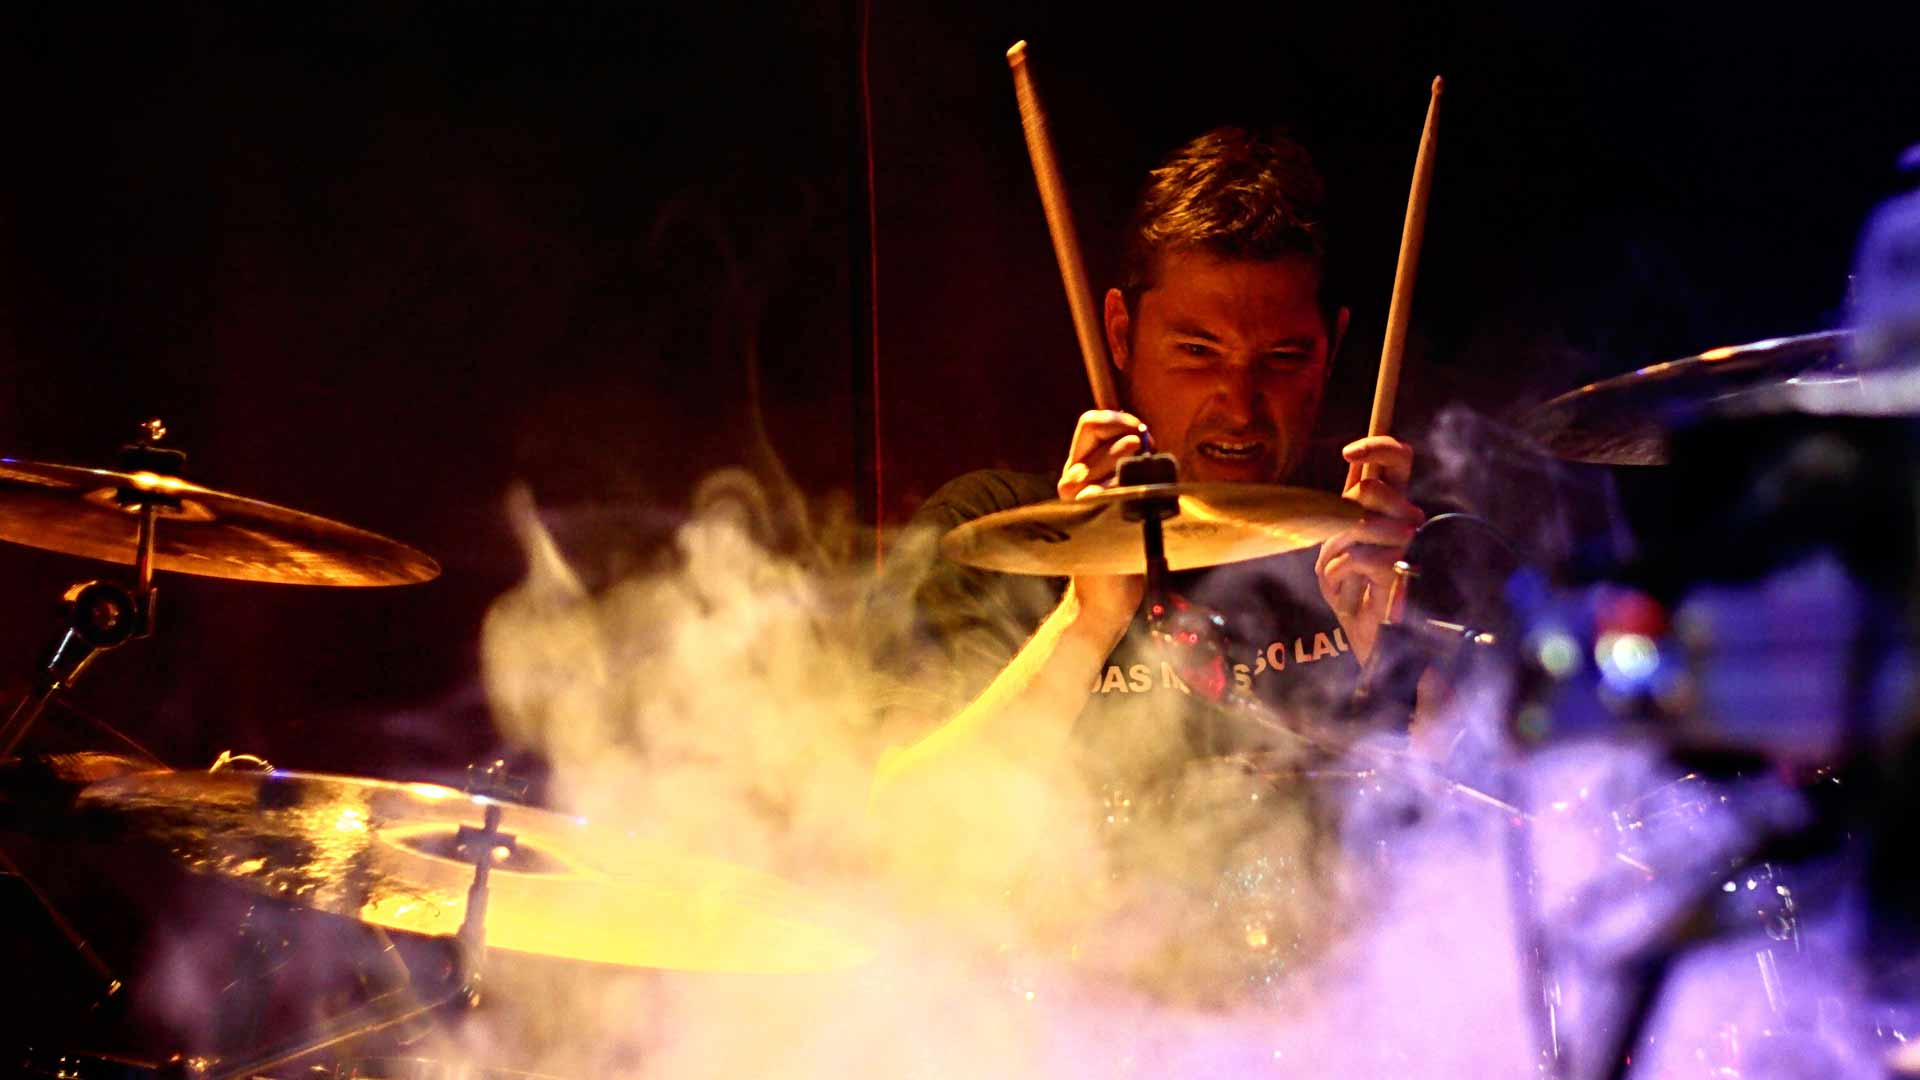 Schlagzeuglehrer Ralf Thomas